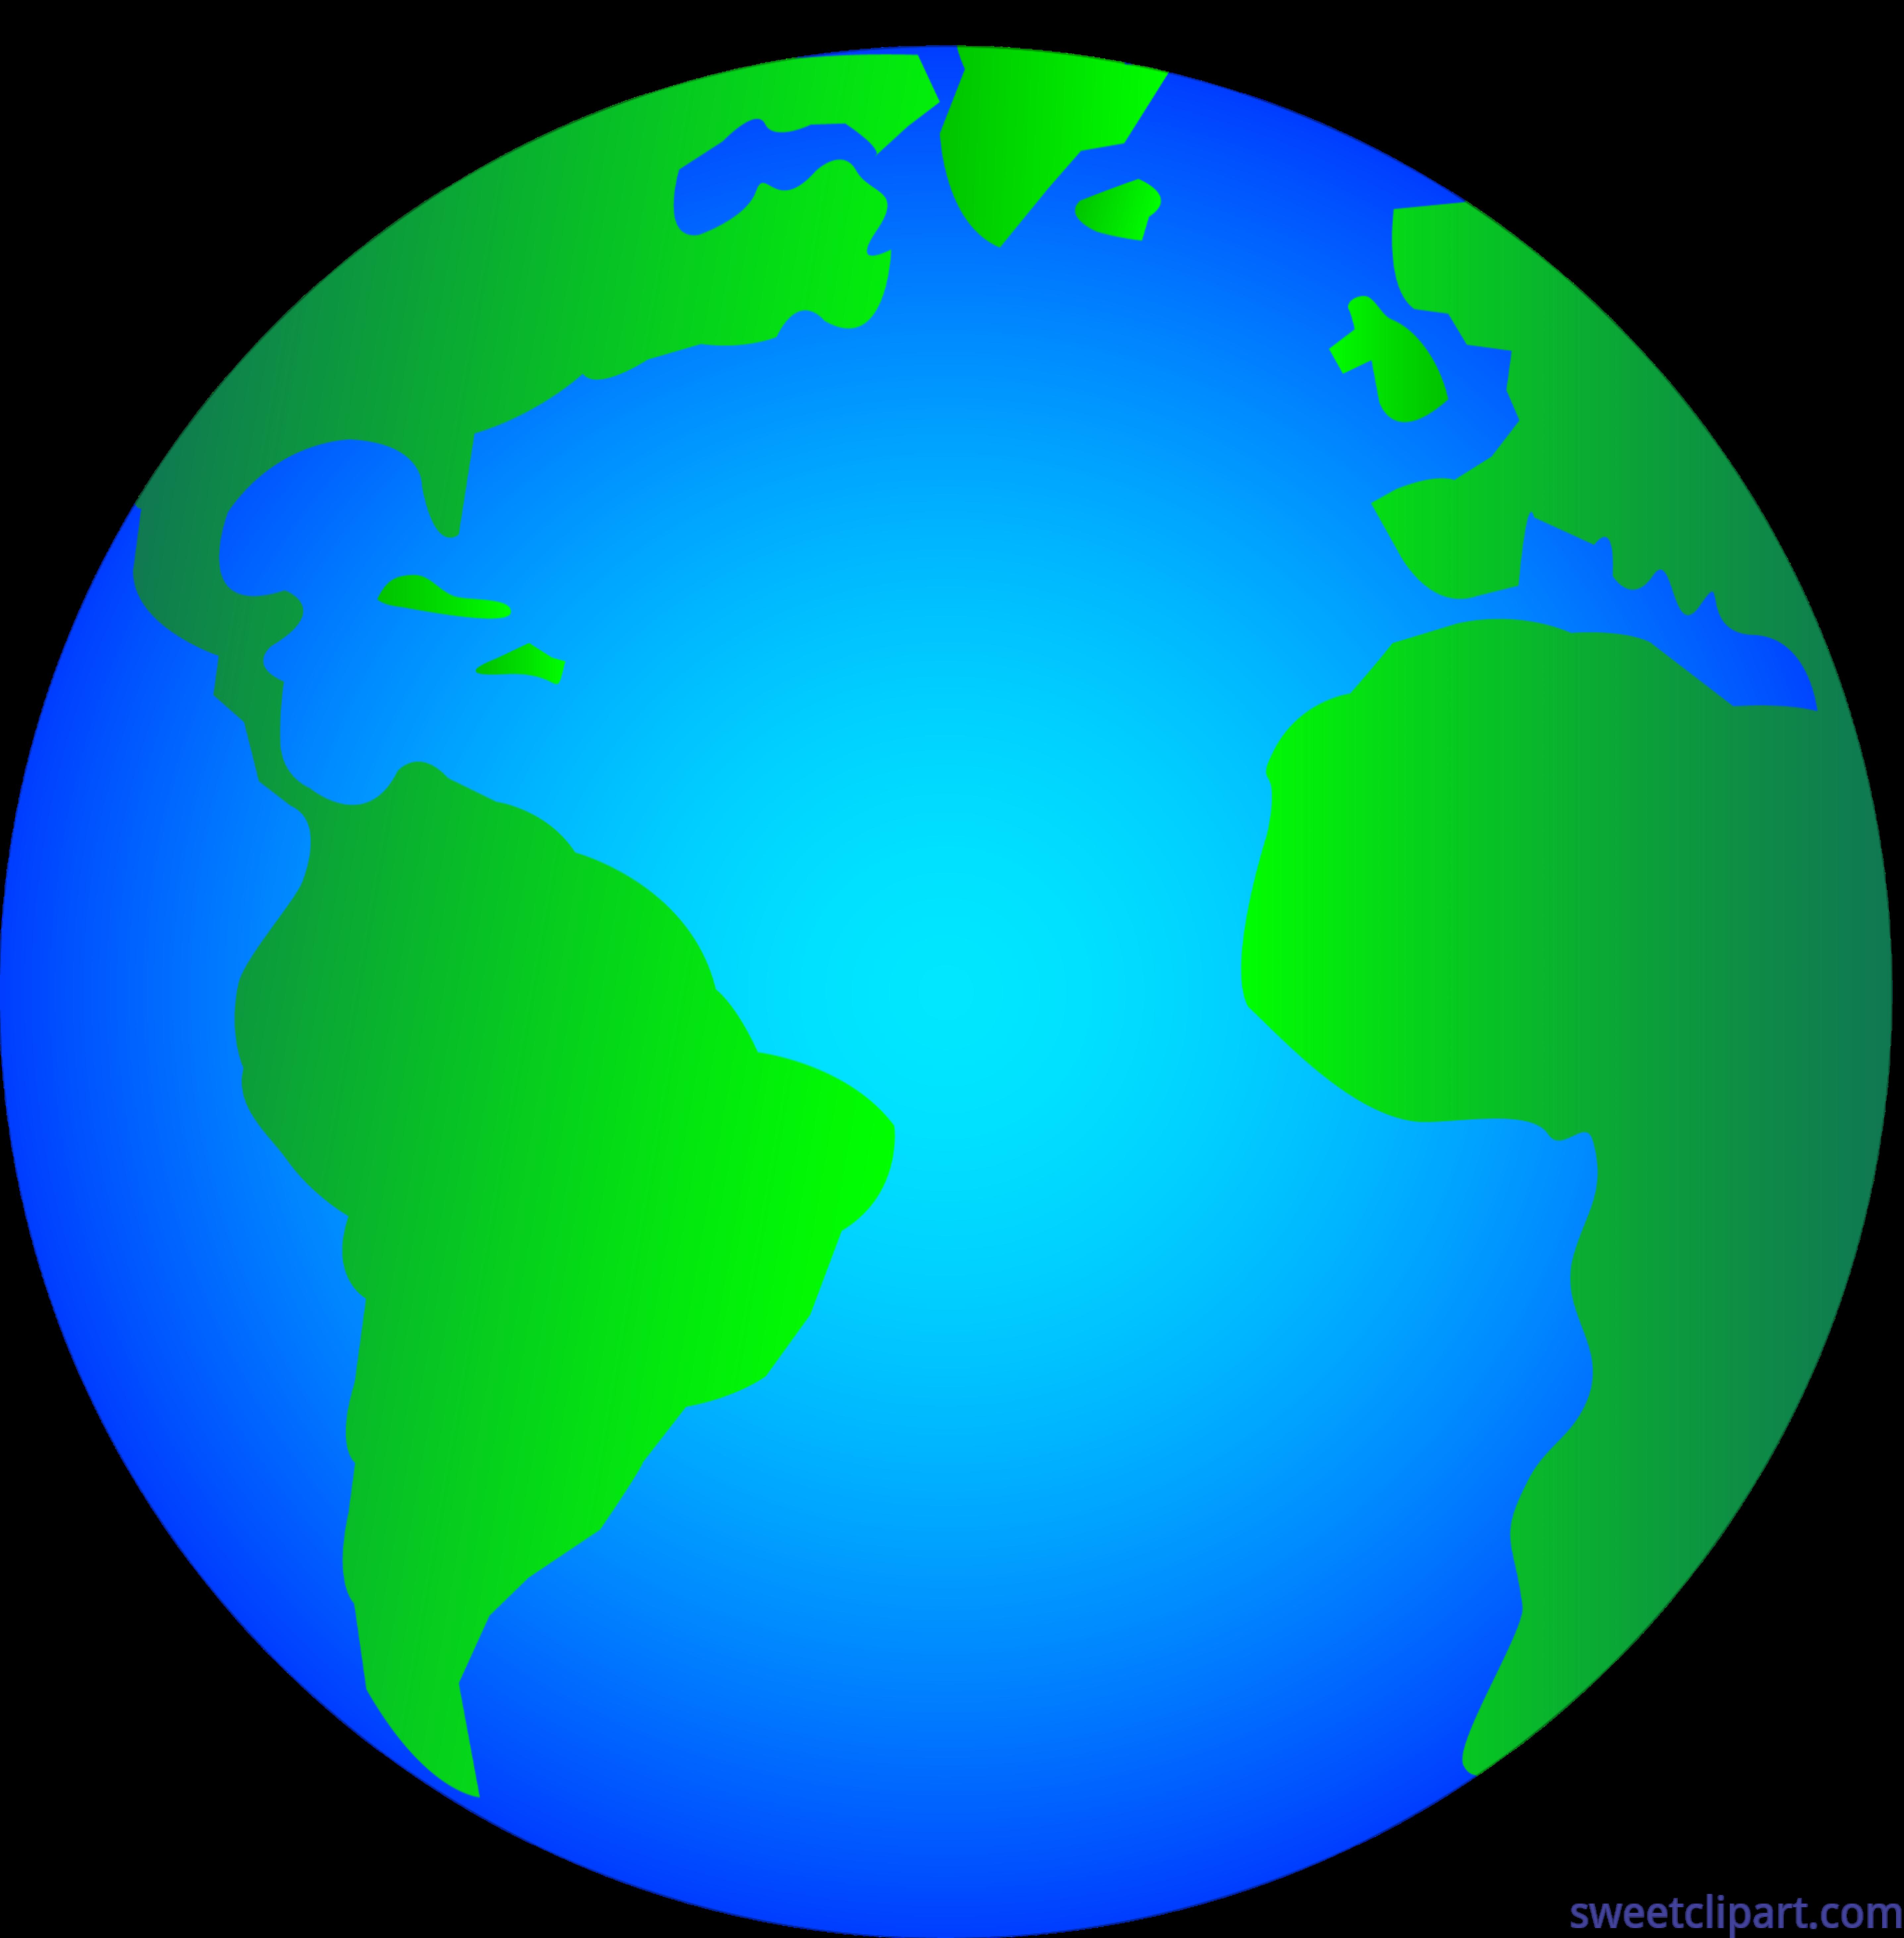 Shiny glossy earth logo. Planets clipart simple